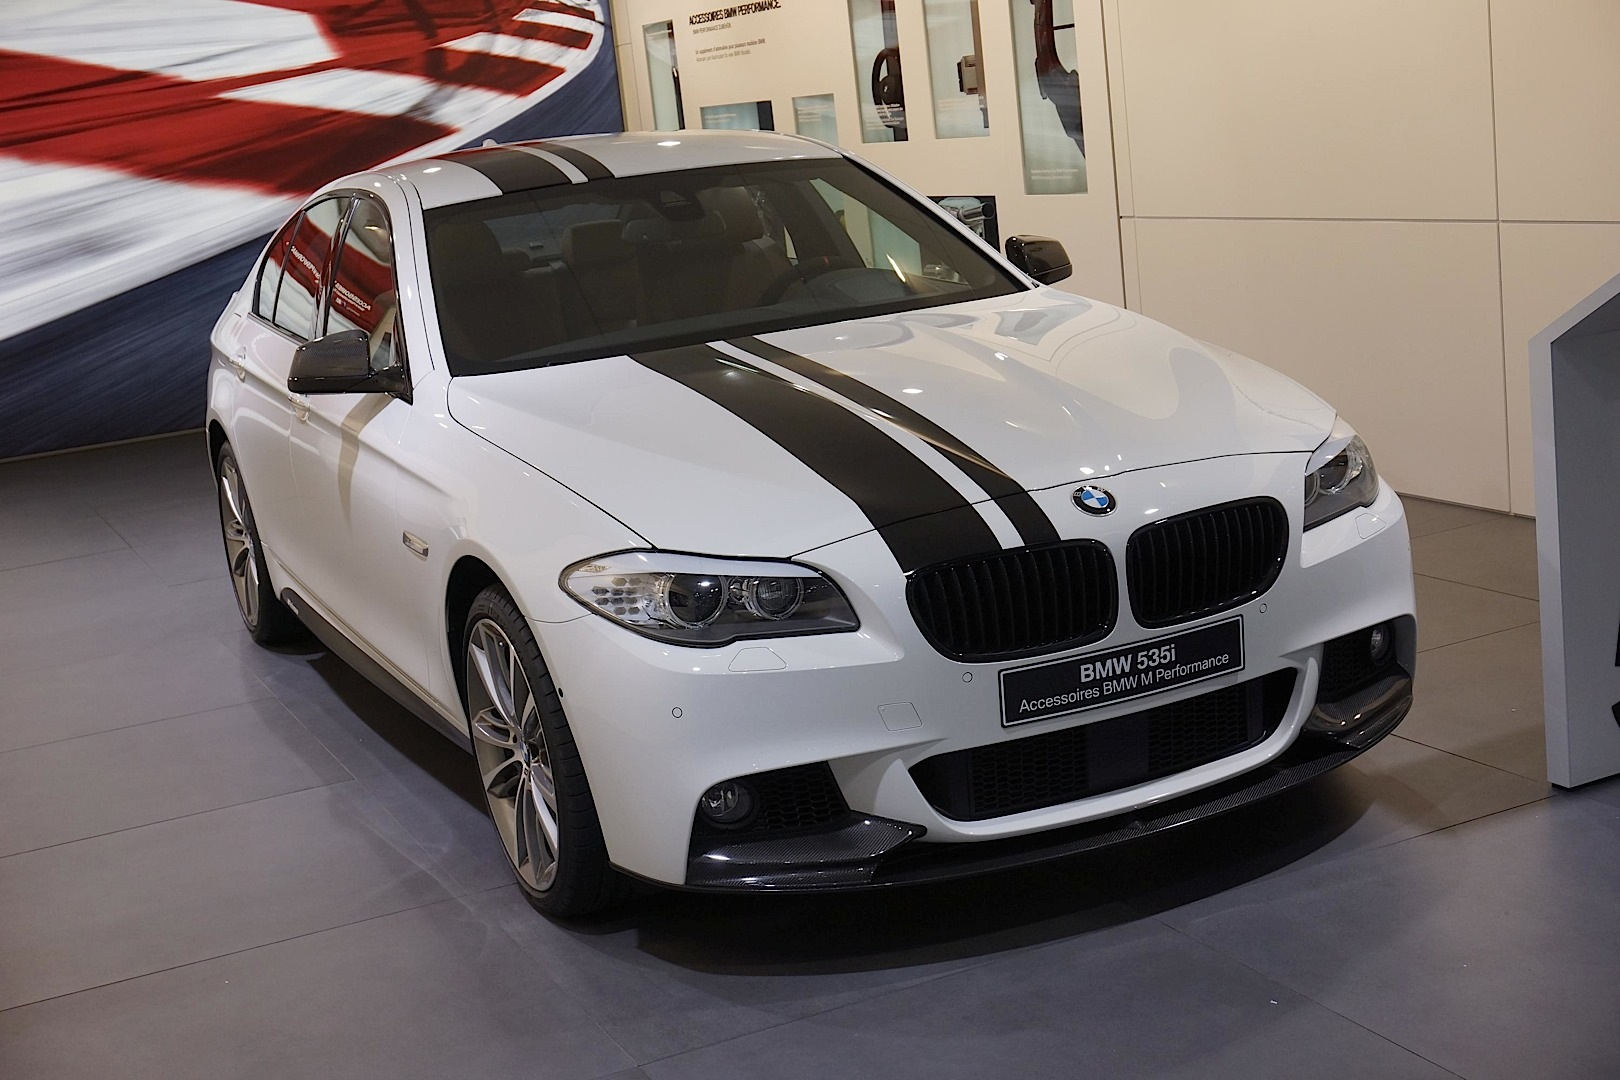 Striped Bmw F10 535i M Sport Shows Up In Geneva Autoevolution